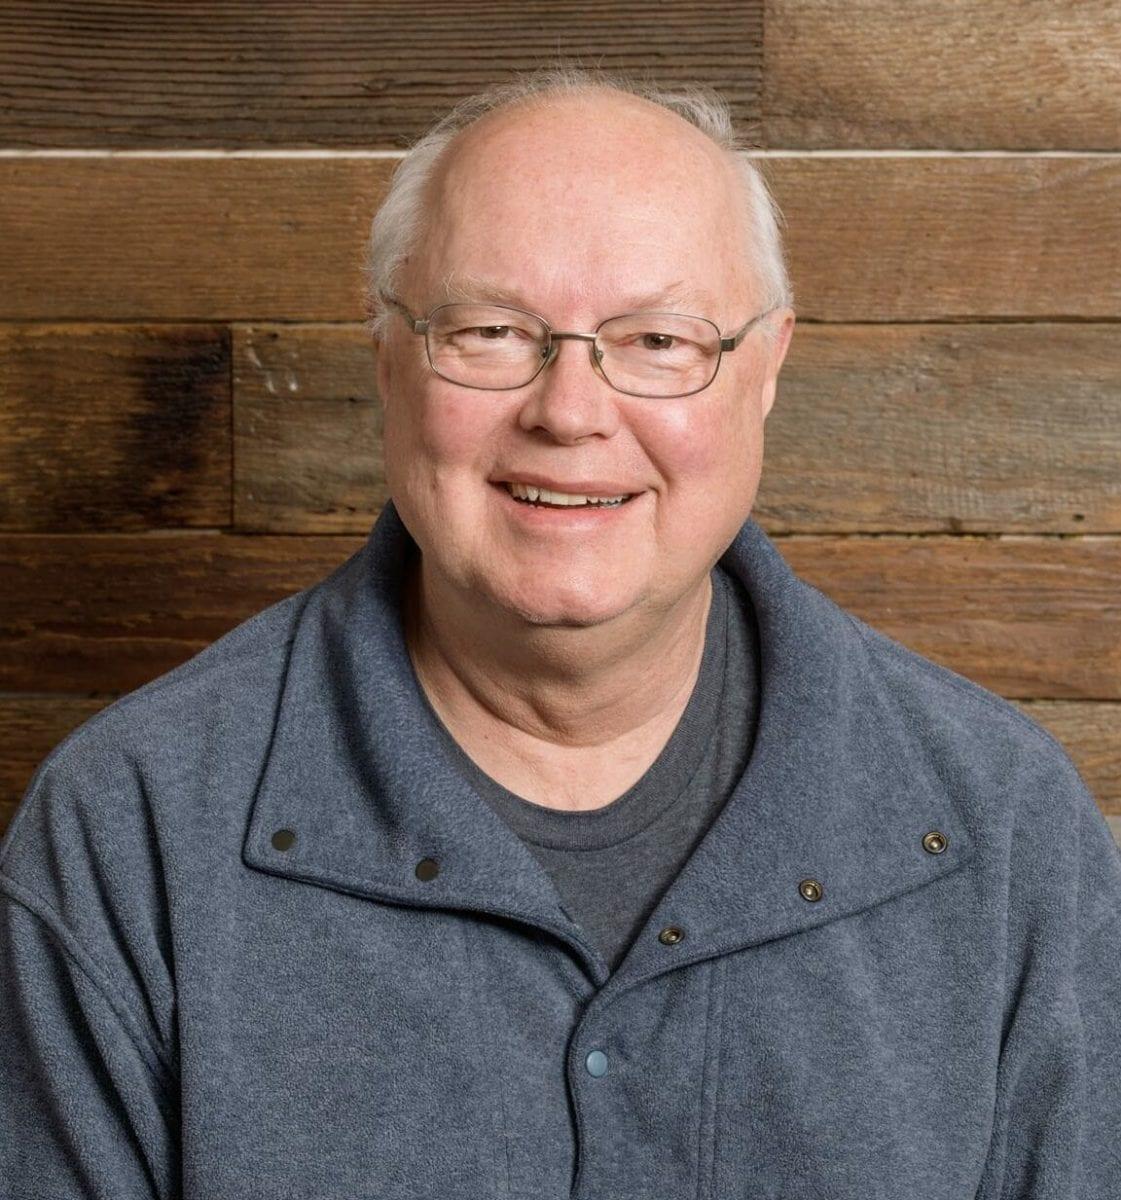 Larry McGee